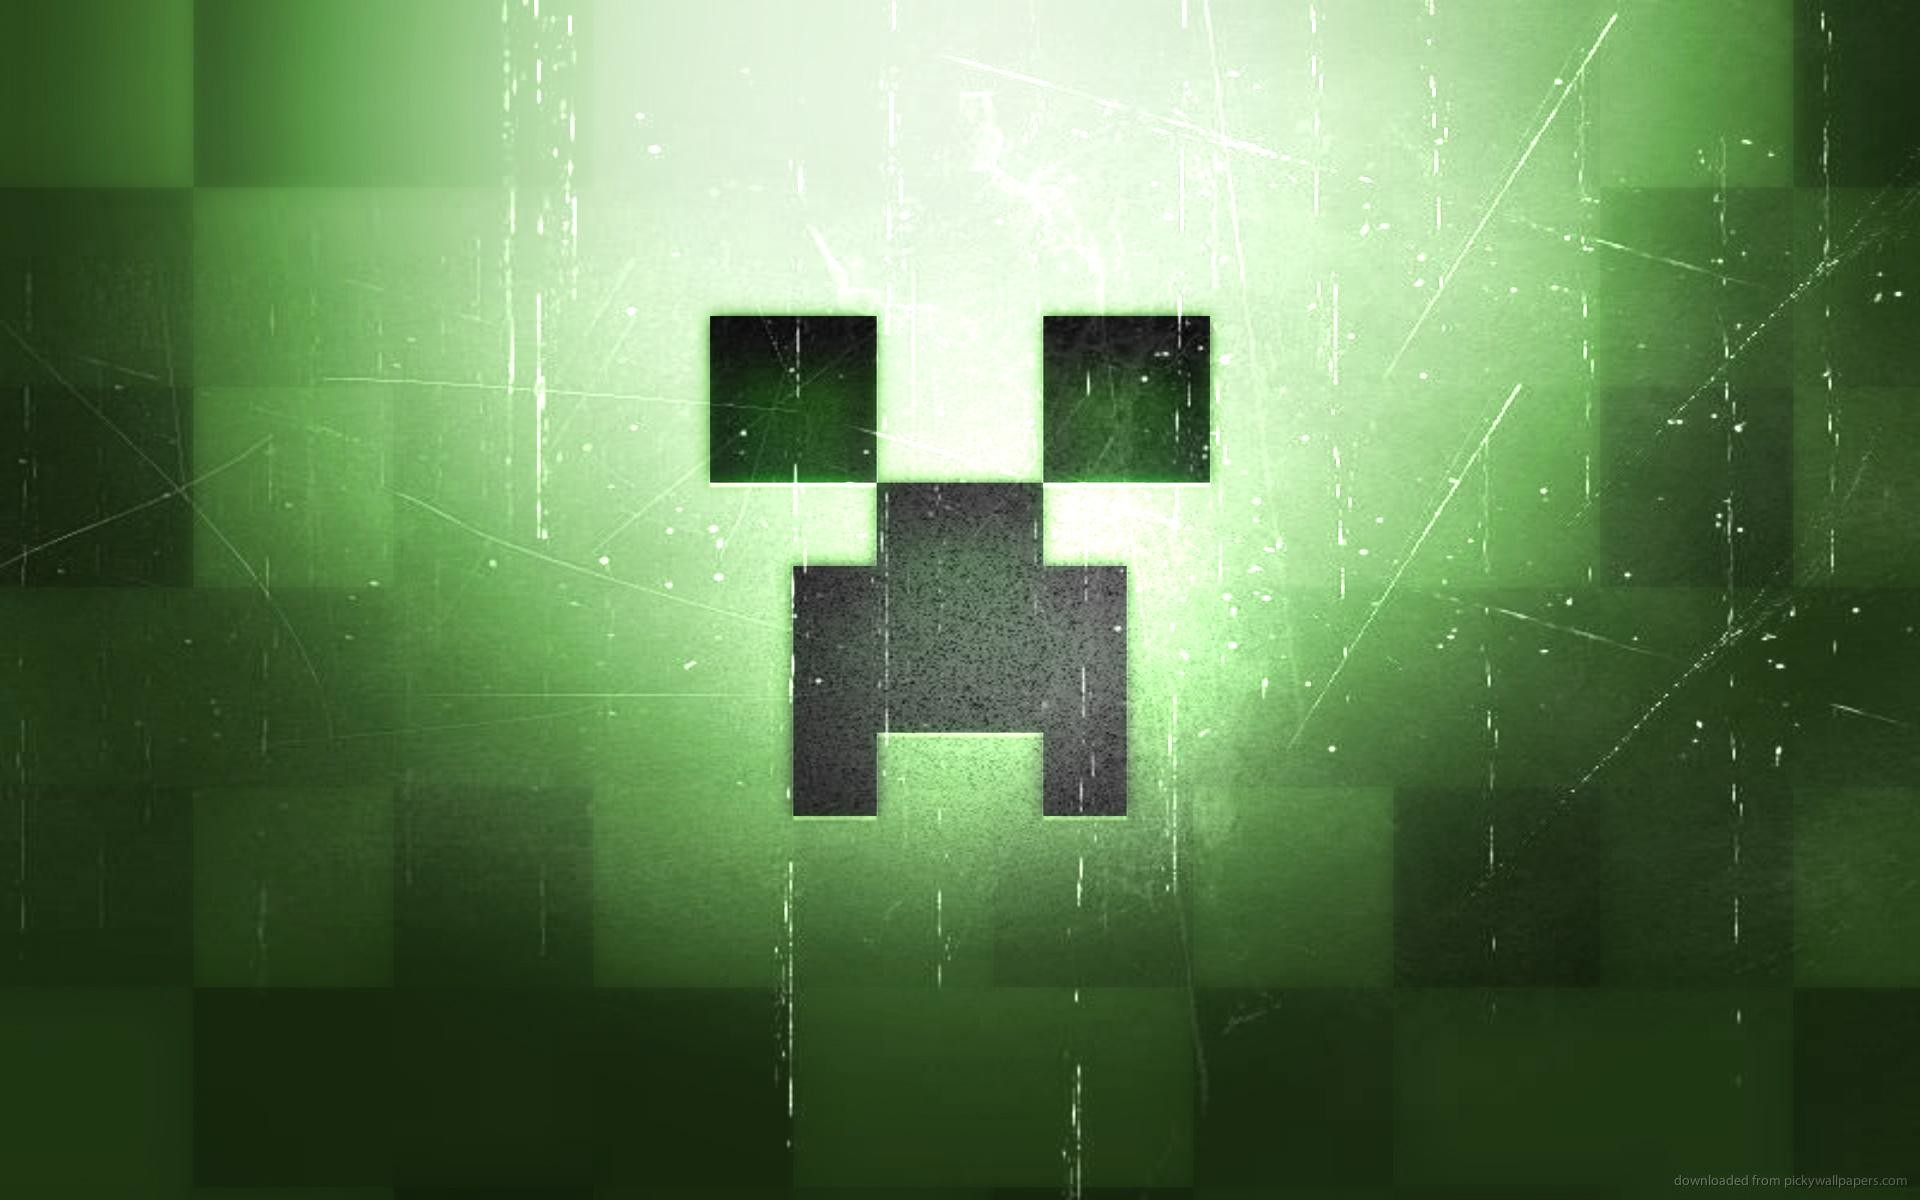 Minecraft Creeper Wallpaper 76 Images